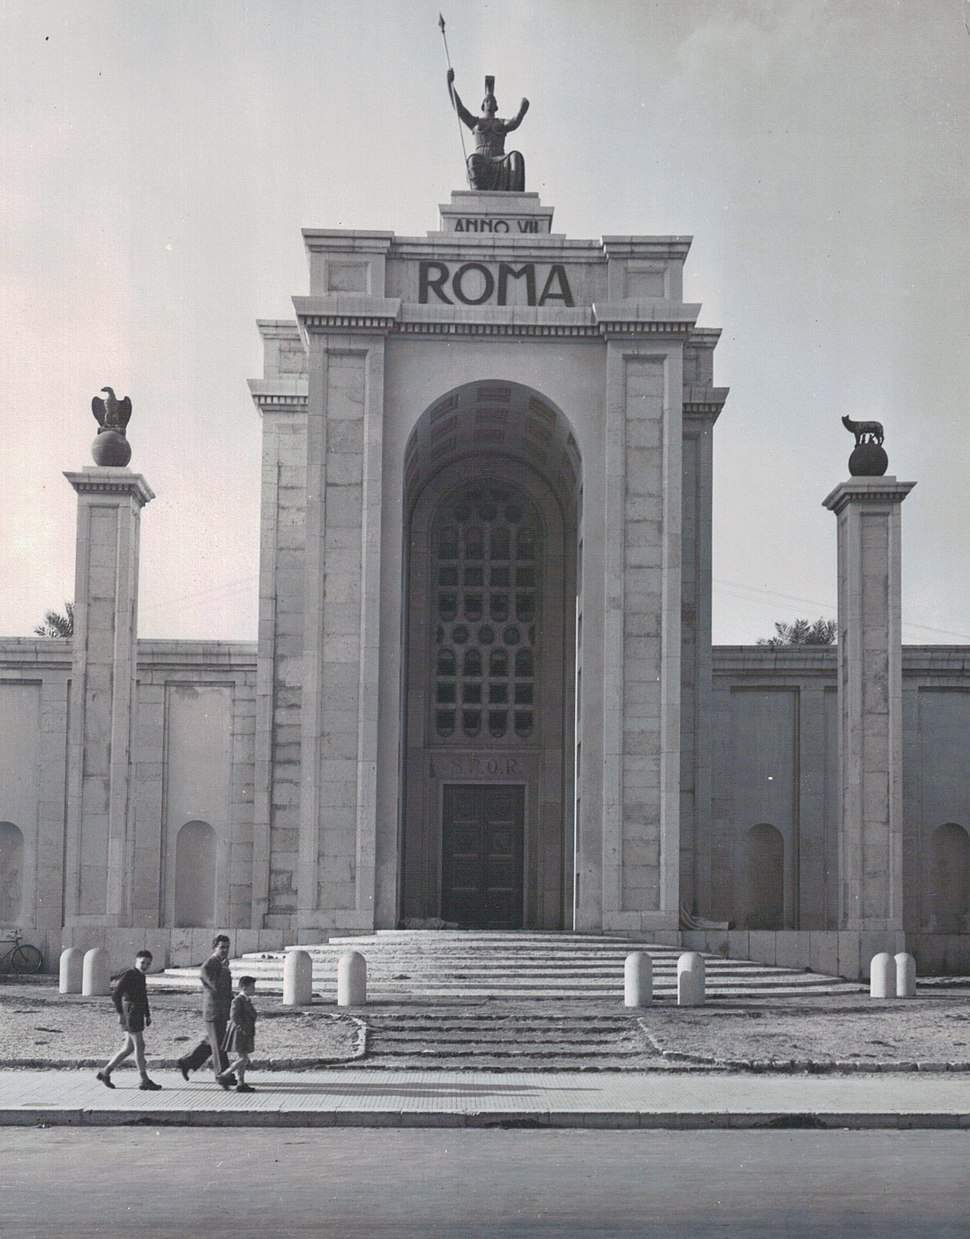 Romans-in-libya-circi-1950-001 6205513374 o